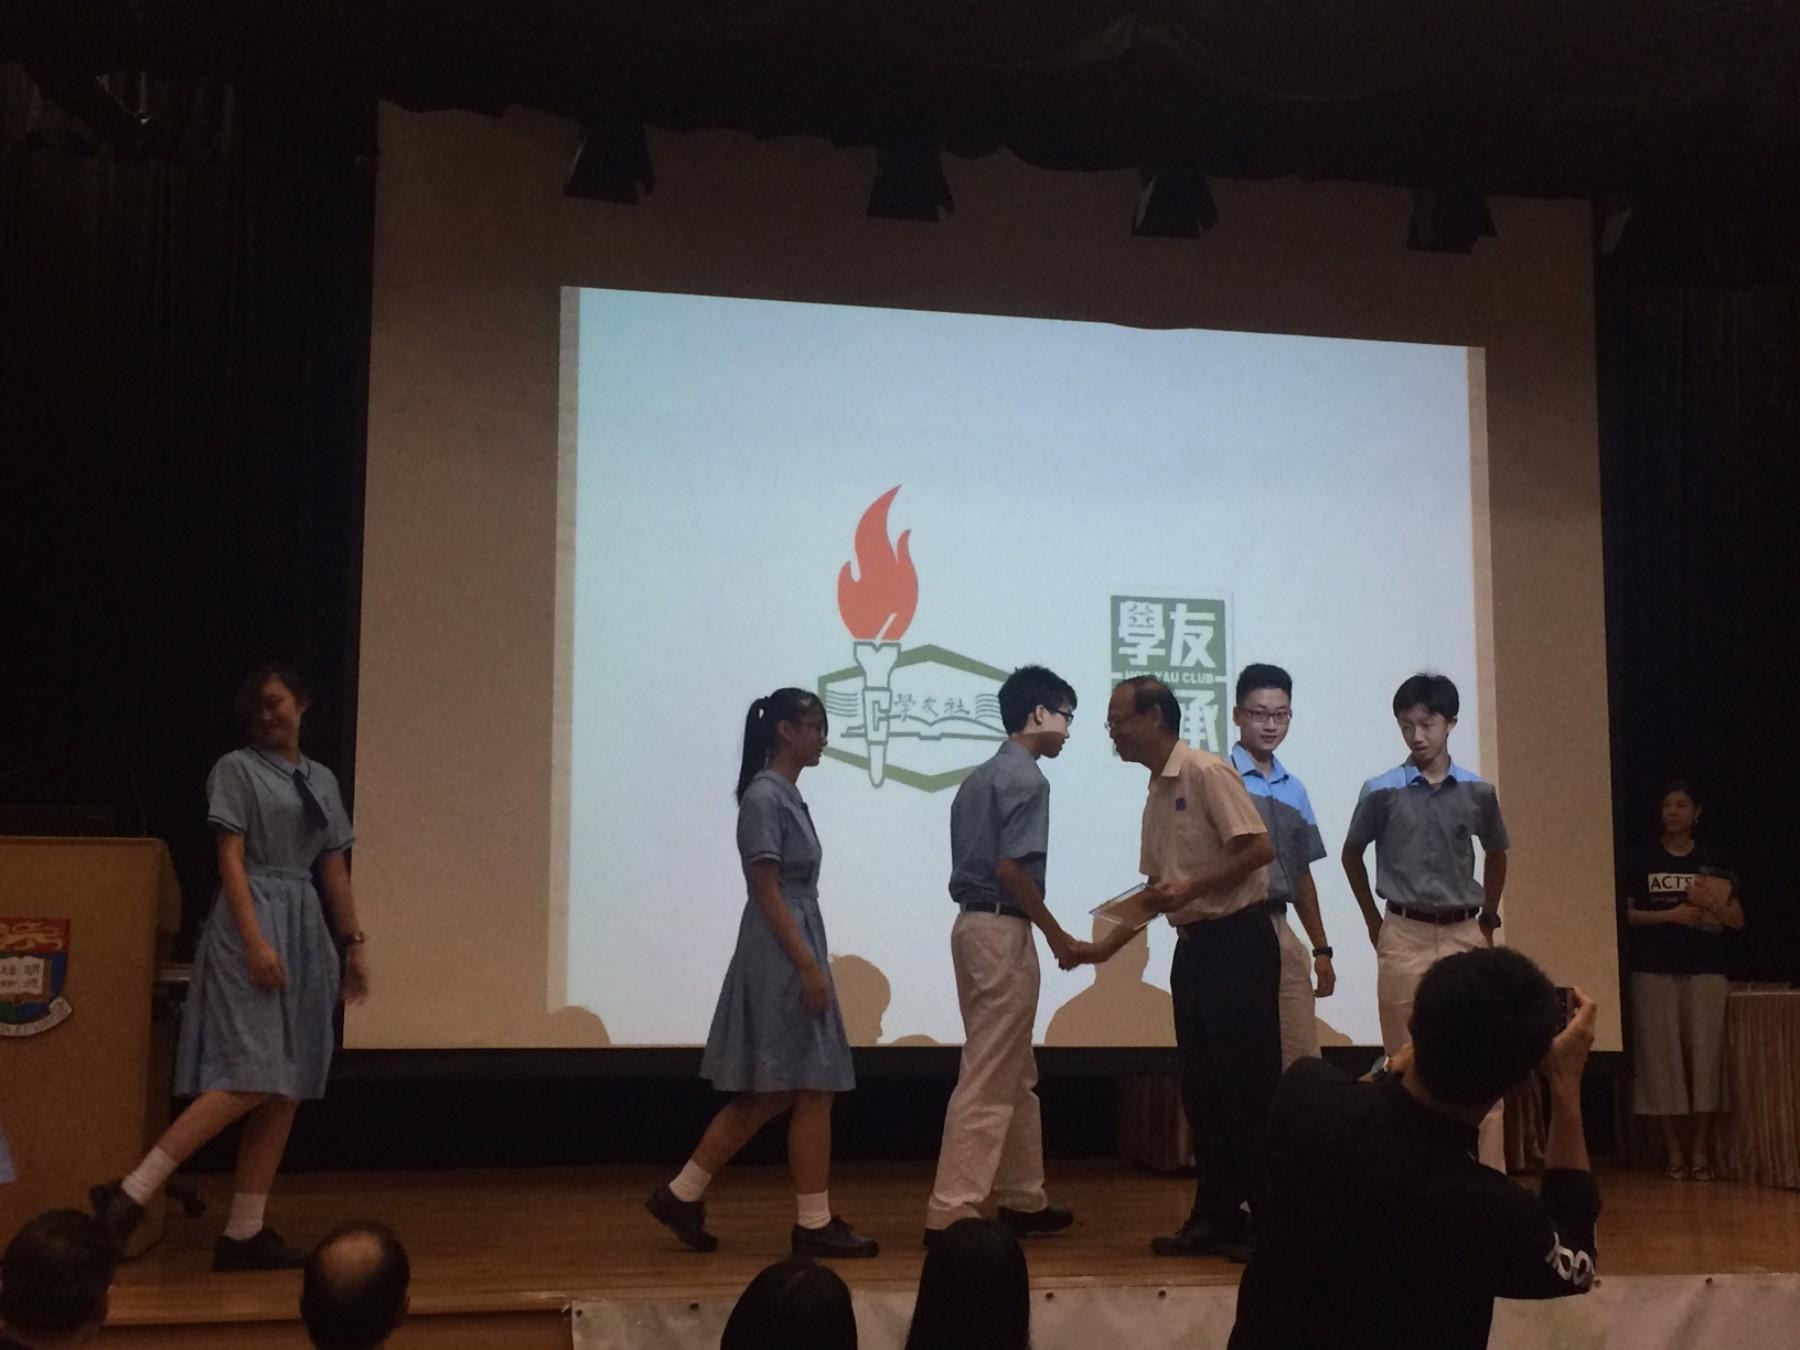 http://www.npc.edu.hk/sites/default/files/img_5938.jpg